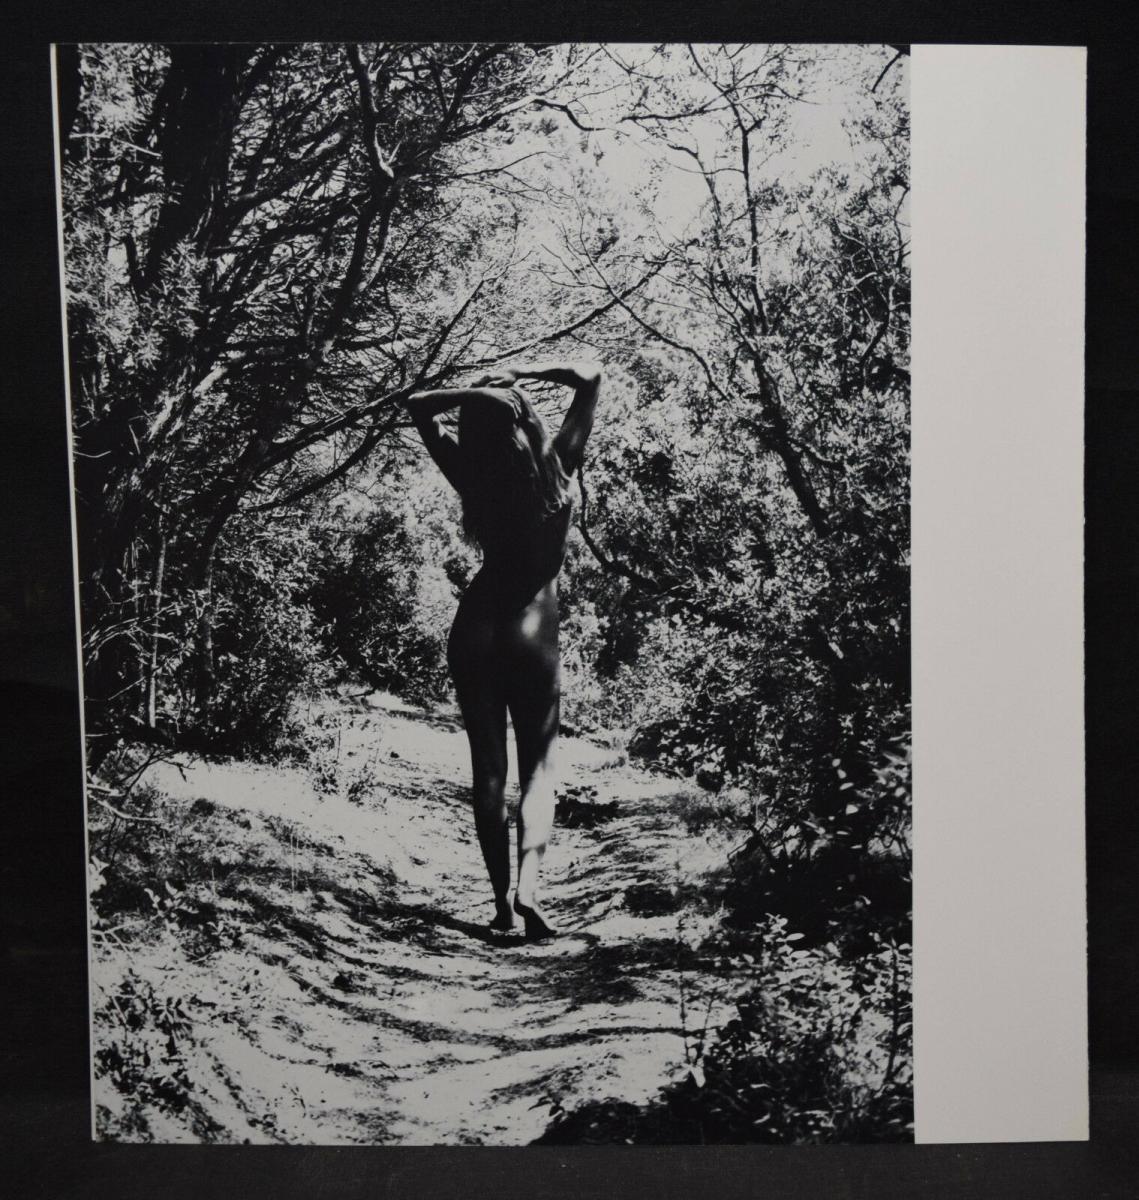 ANDRÉ KRETZ - CANTATE A NAUSICAA - WIDMUNG - ORIGINALZEICHNUNG - 1980 - FOTOS 10